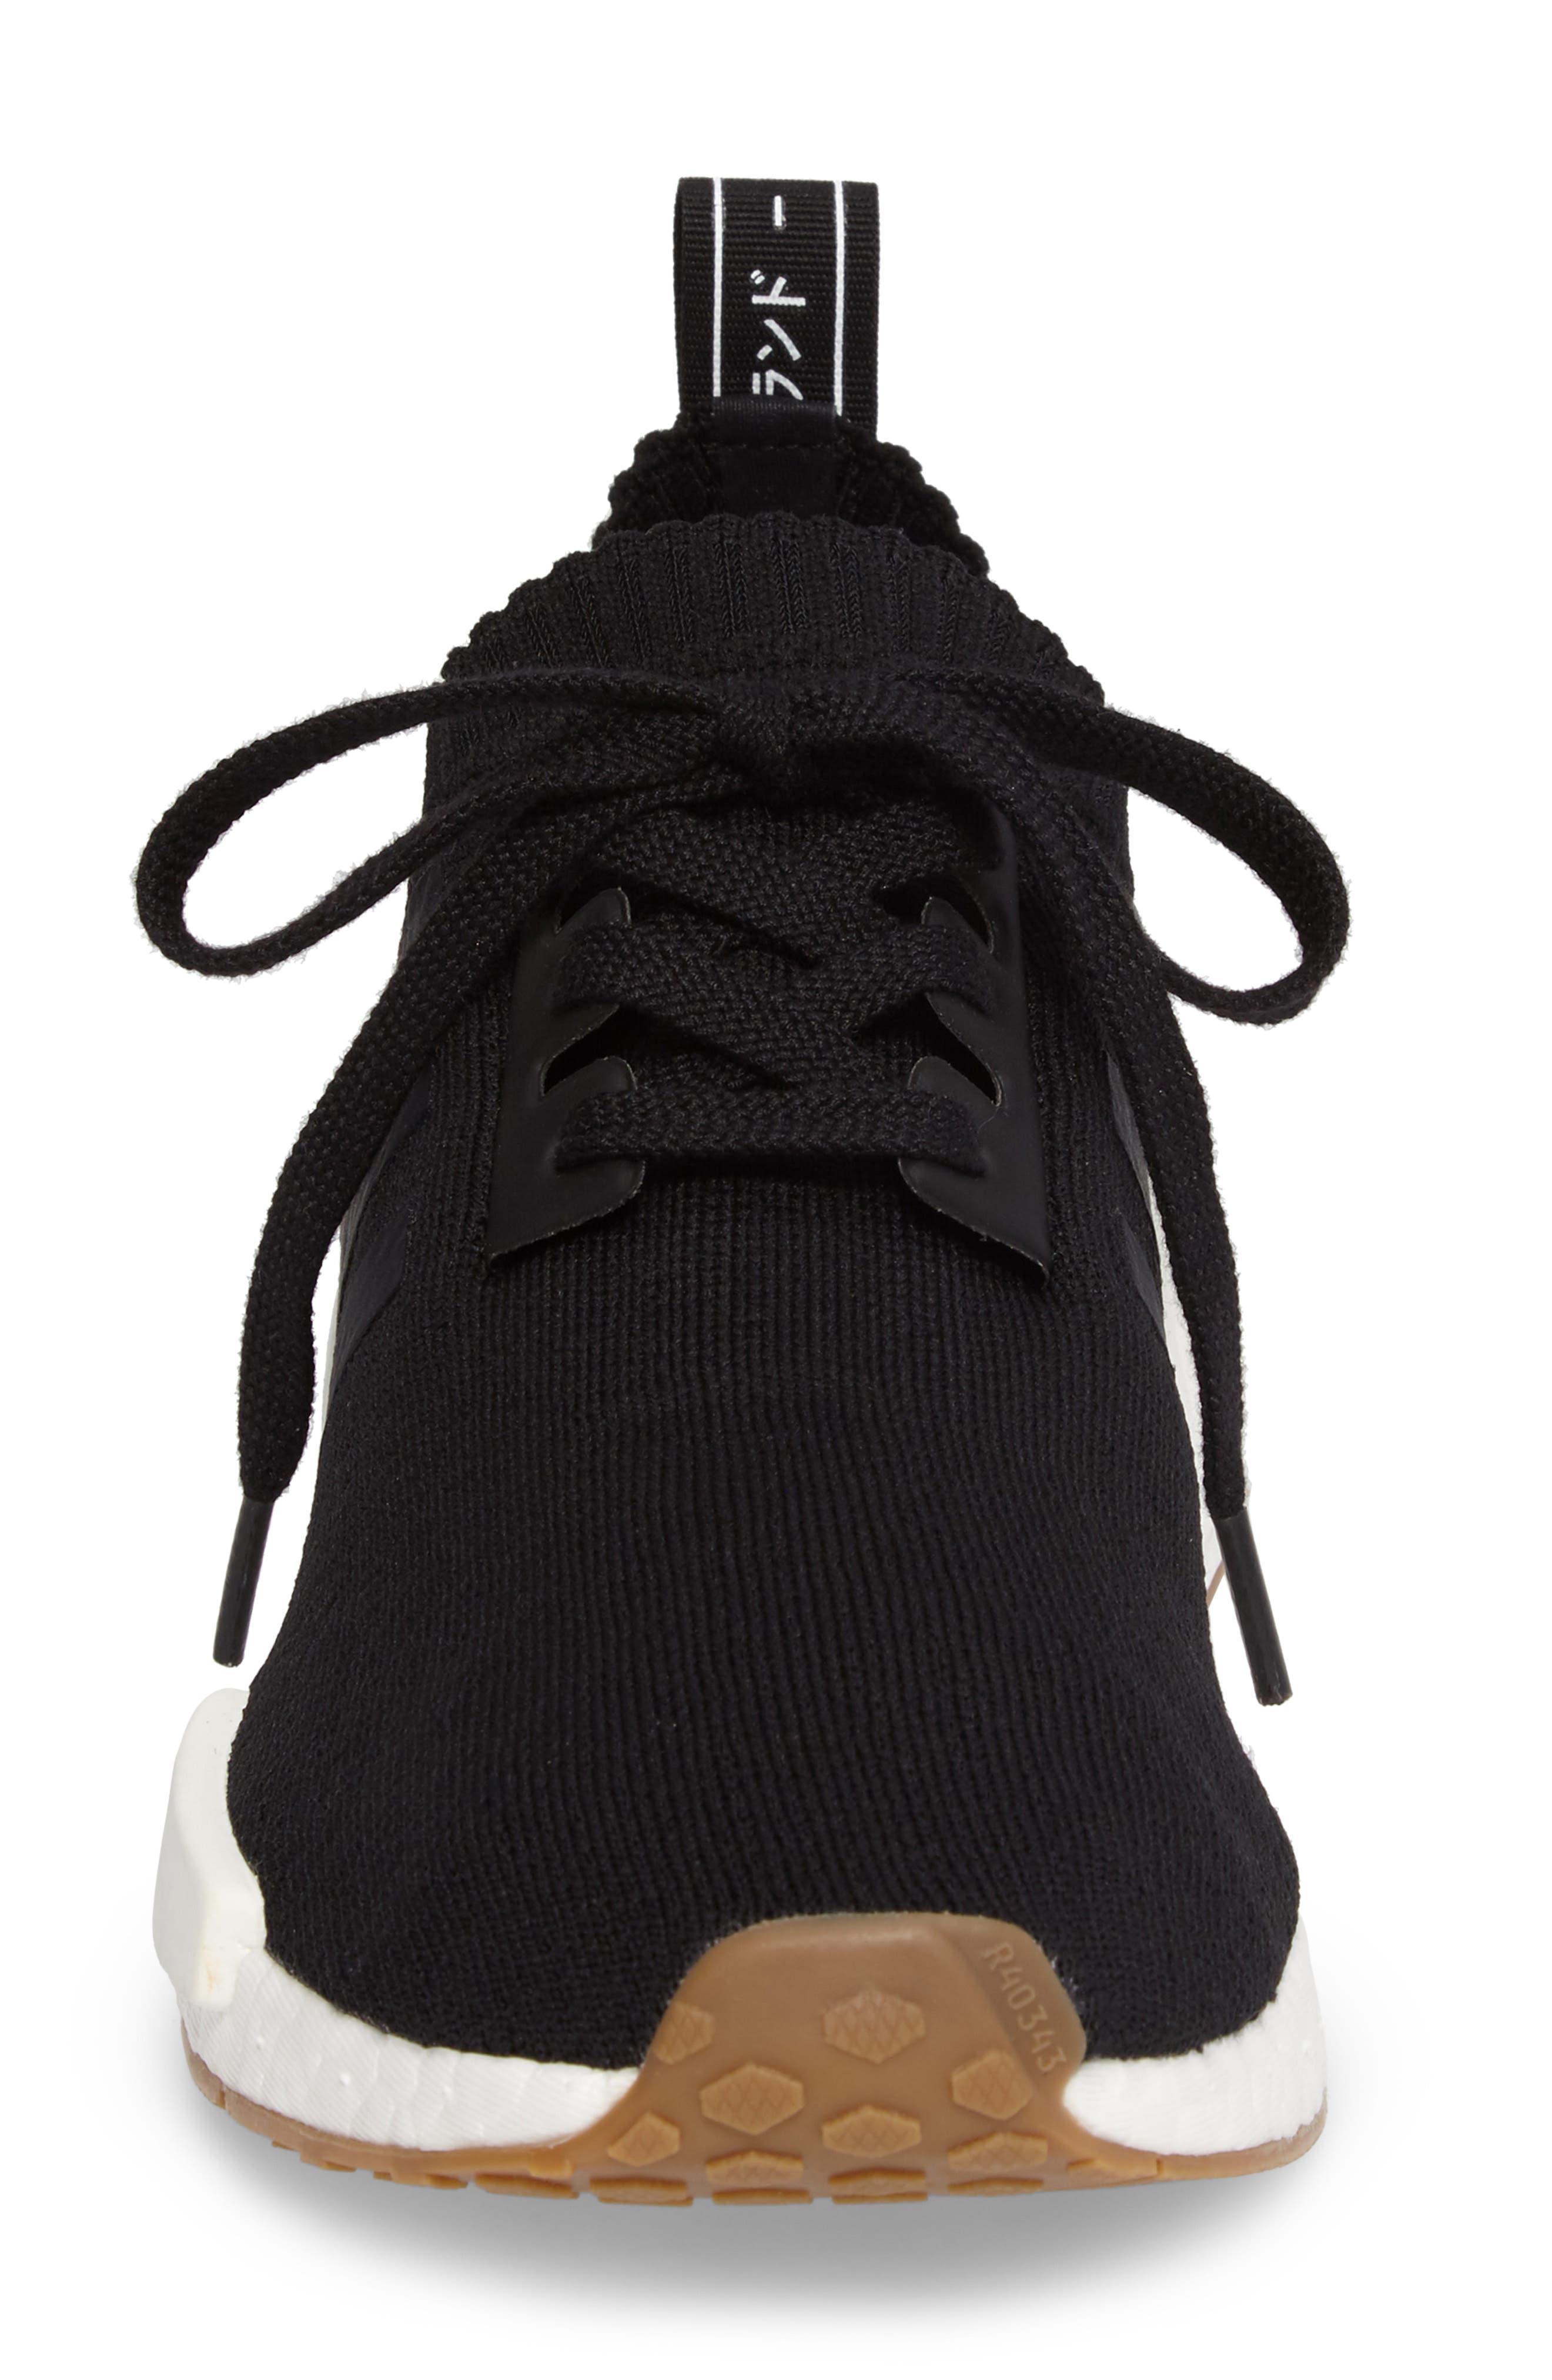 NMD R1 Primeknit Sneaker,                             Alternate thumbnail 4, color,                             002